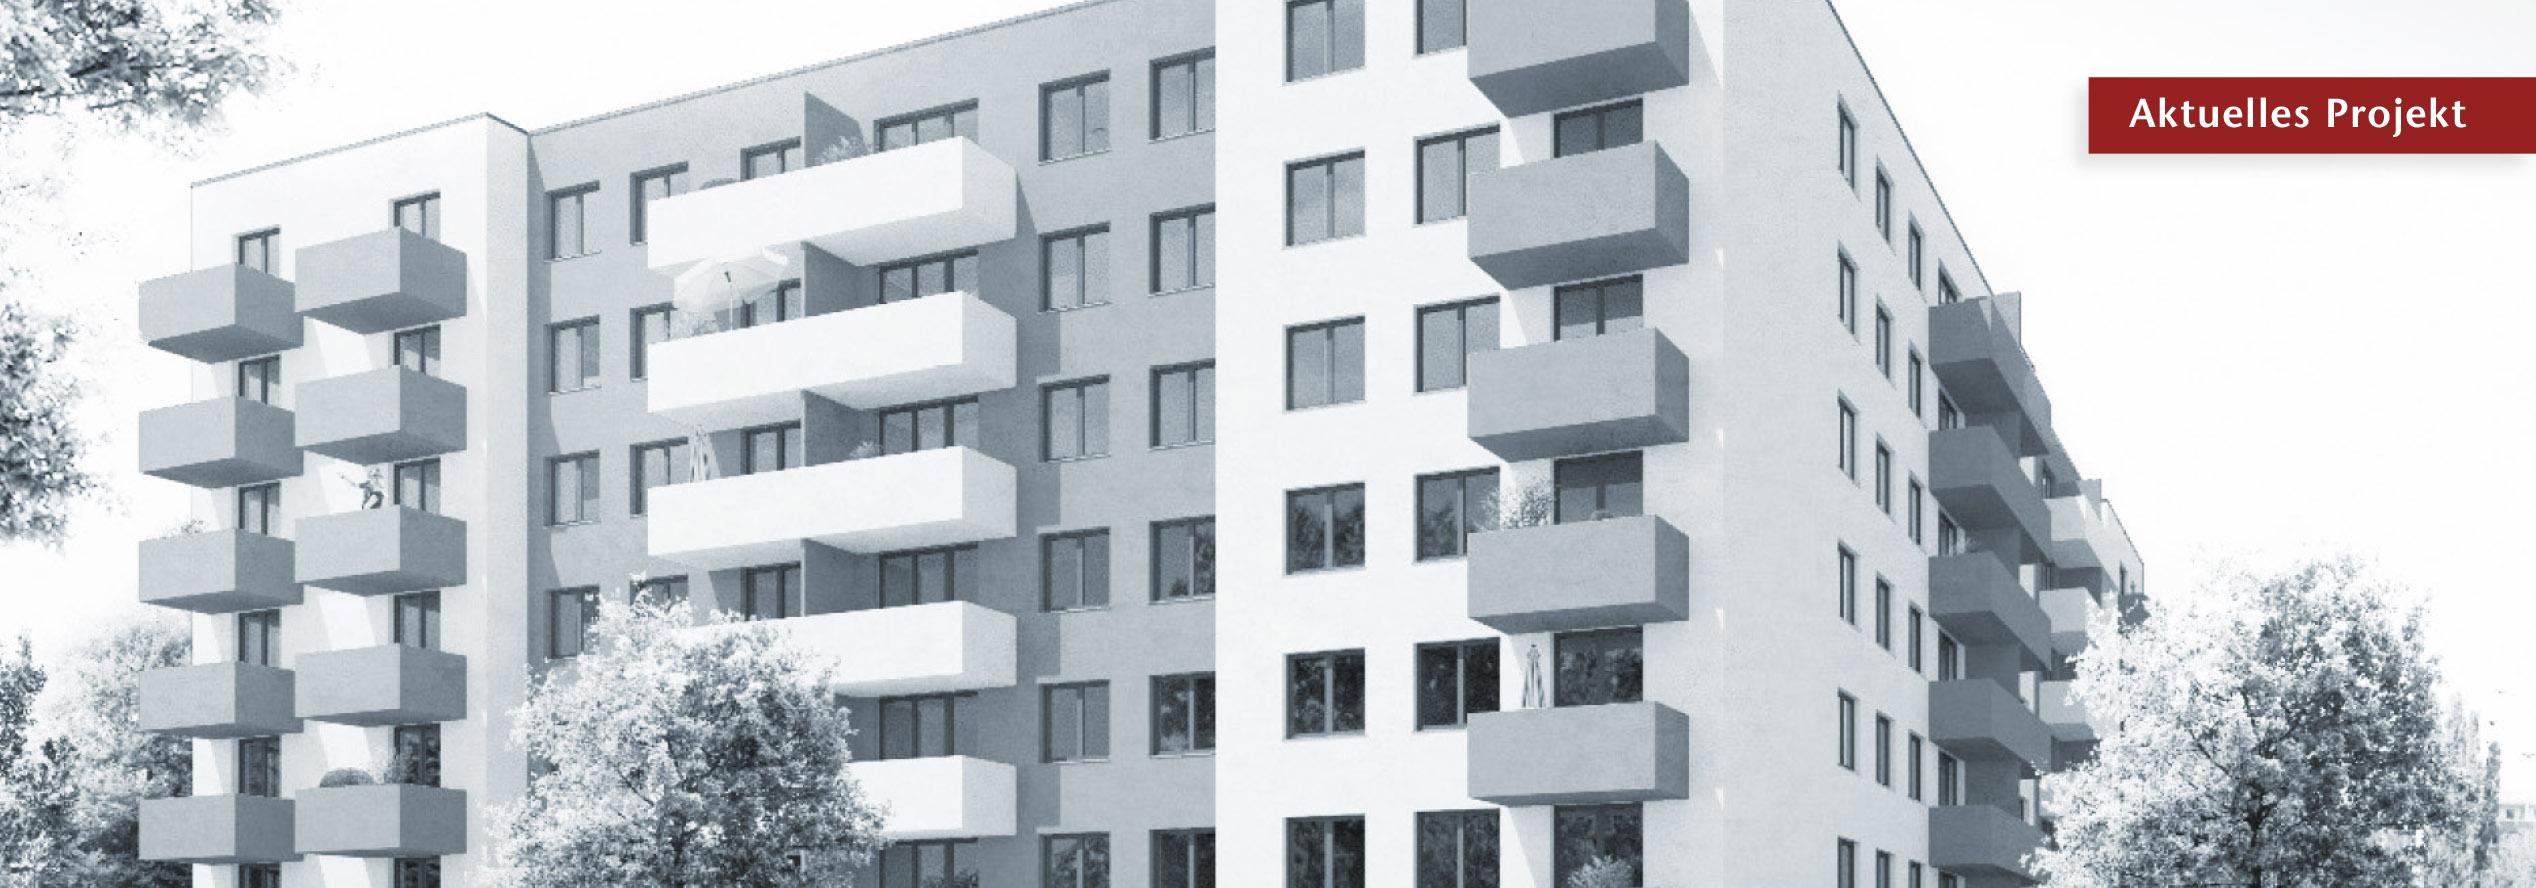 Pöhlbergstraße 13, Berlin